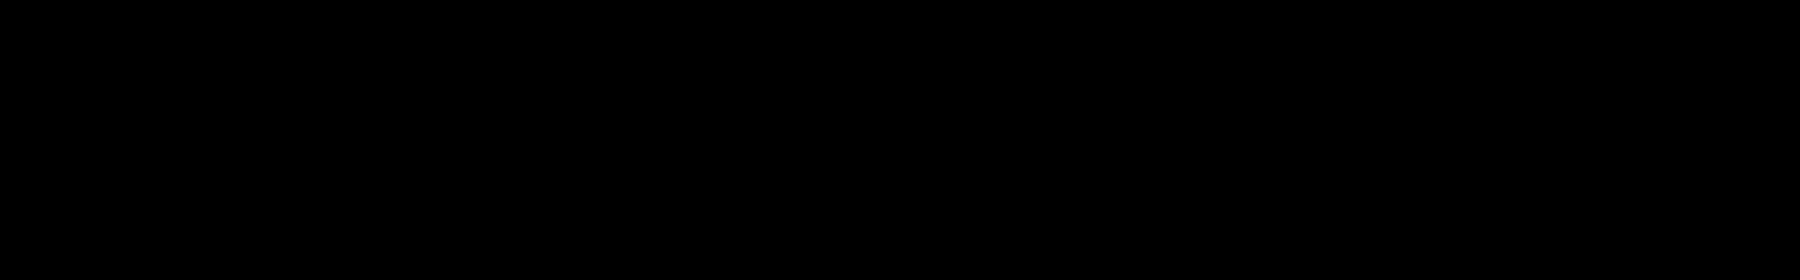 Yonkers Cthulhu audio waveform